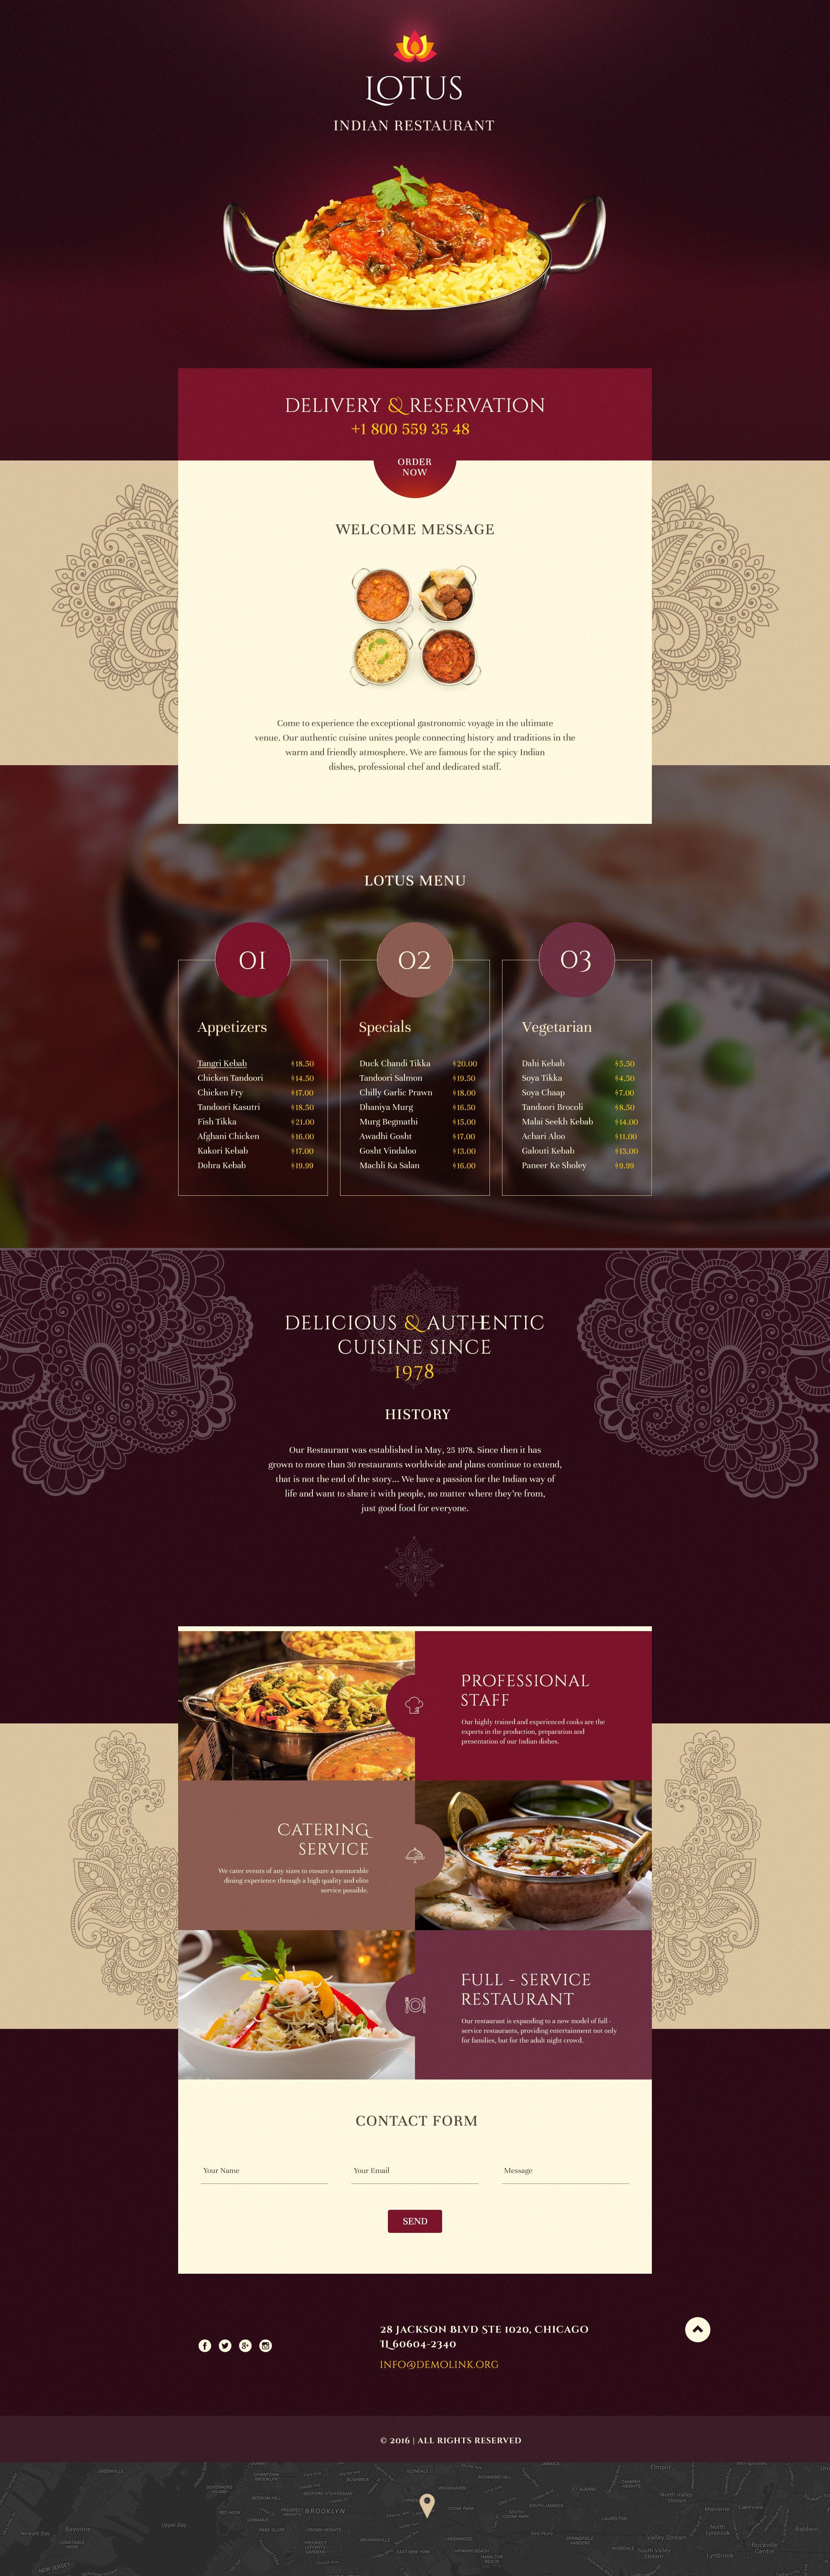 Indian Restaurant Responsive Landing Page Template | Pinterest ...